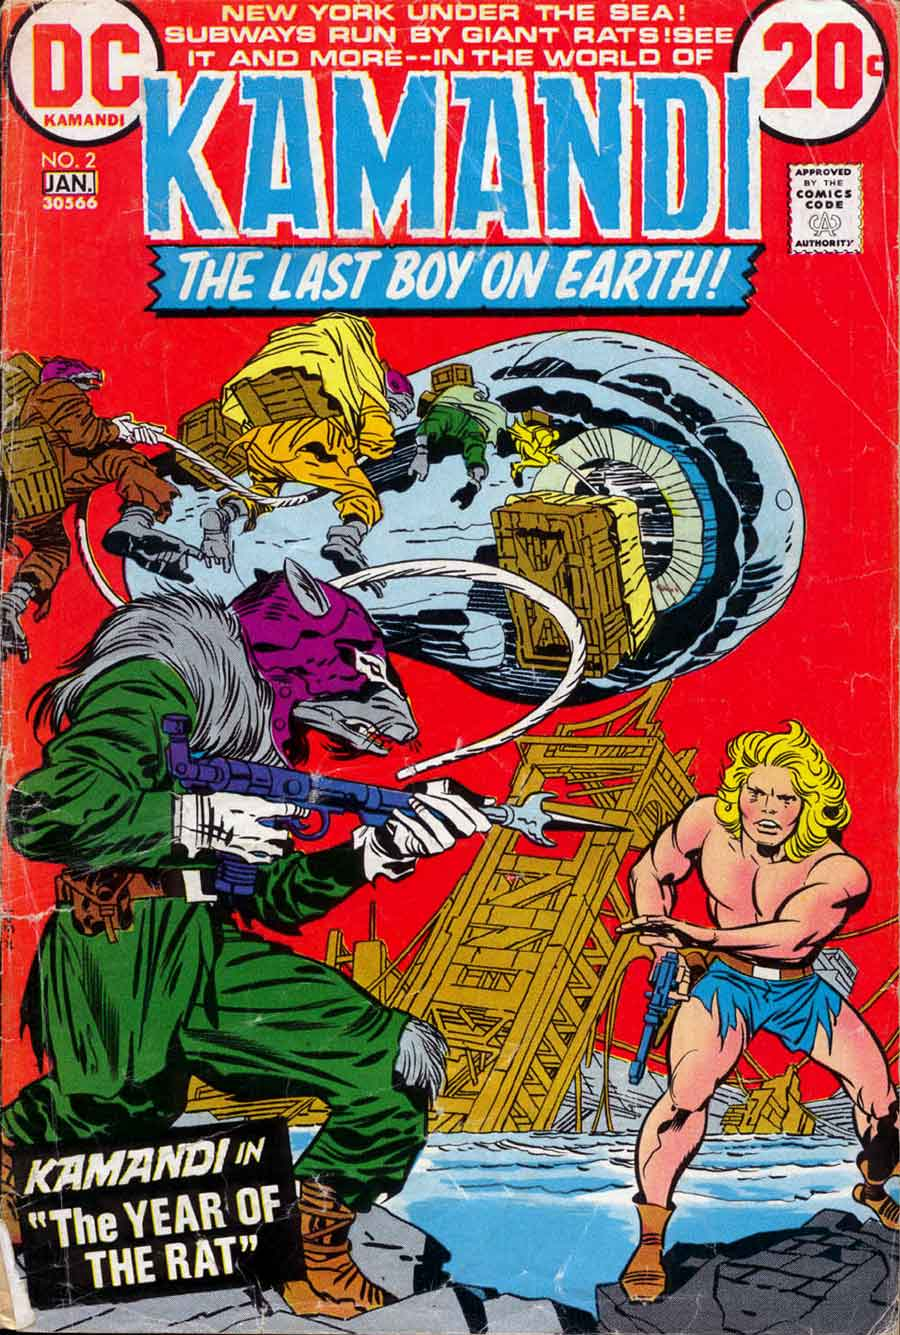 Kamandi v1 #2 dc 1970s bronze age comic book cover art by Jack Kirby